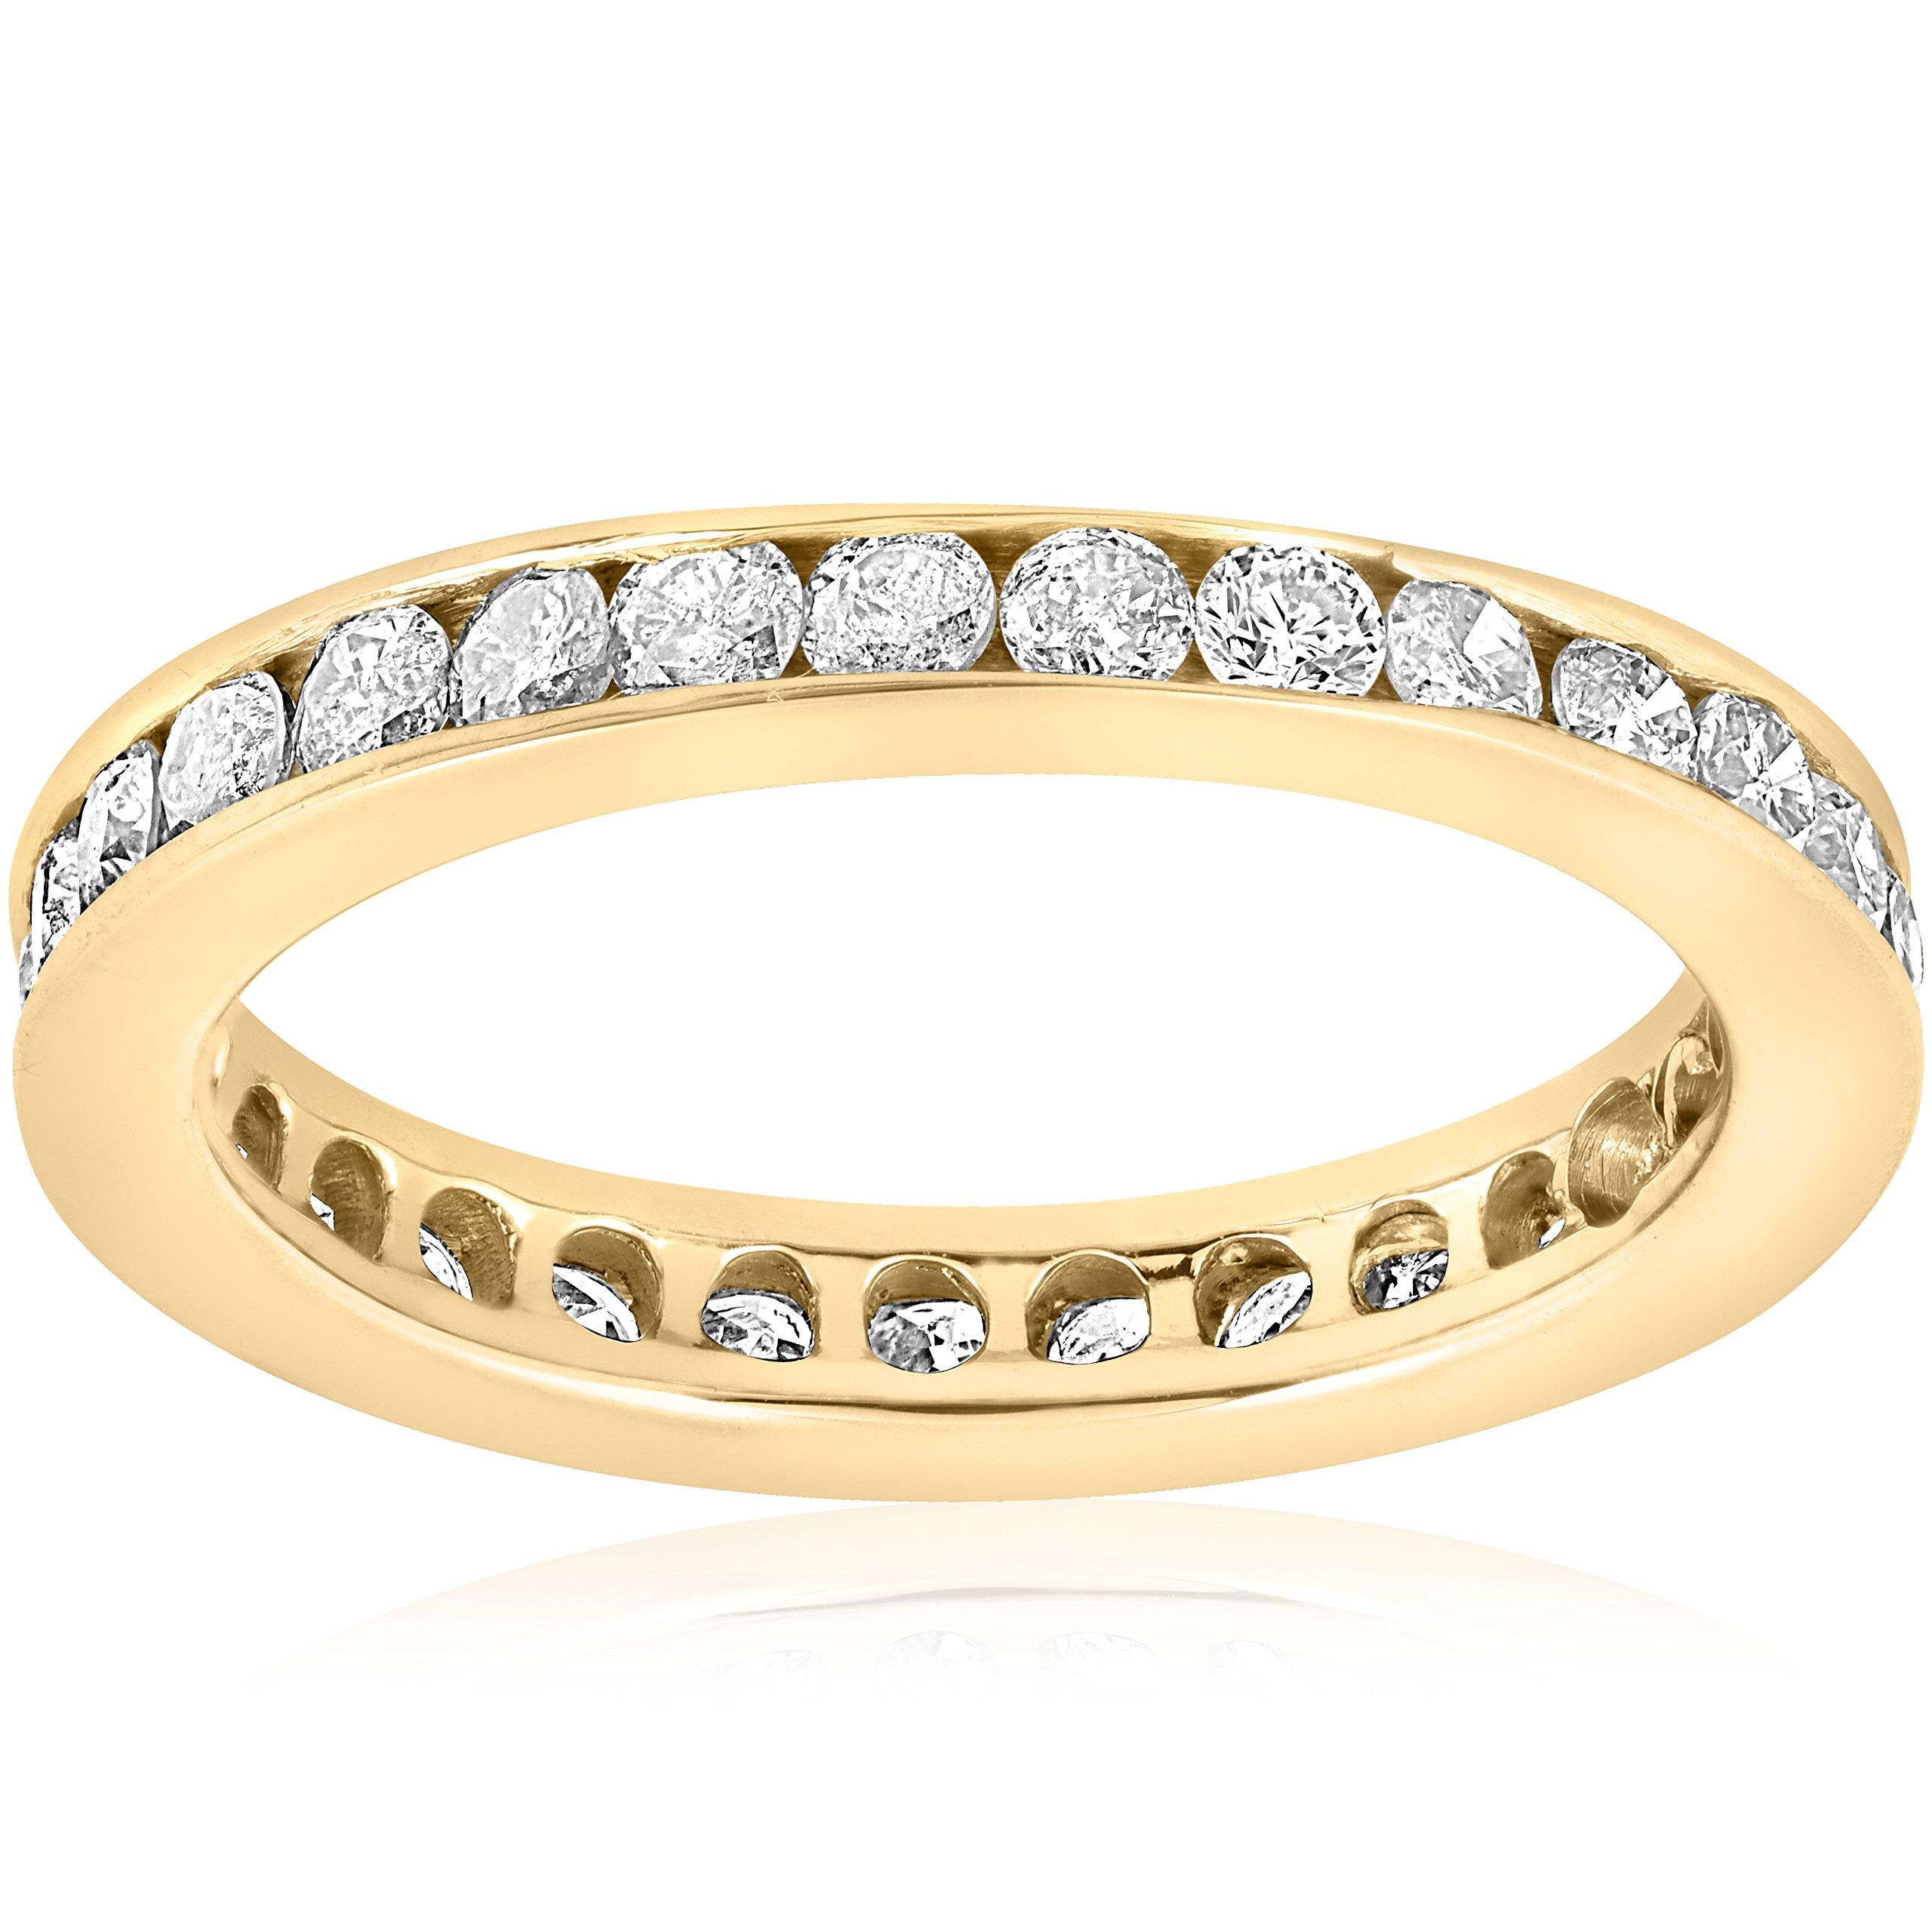 1ct Diamond Wedding Eternity Stackable 14K Ring New